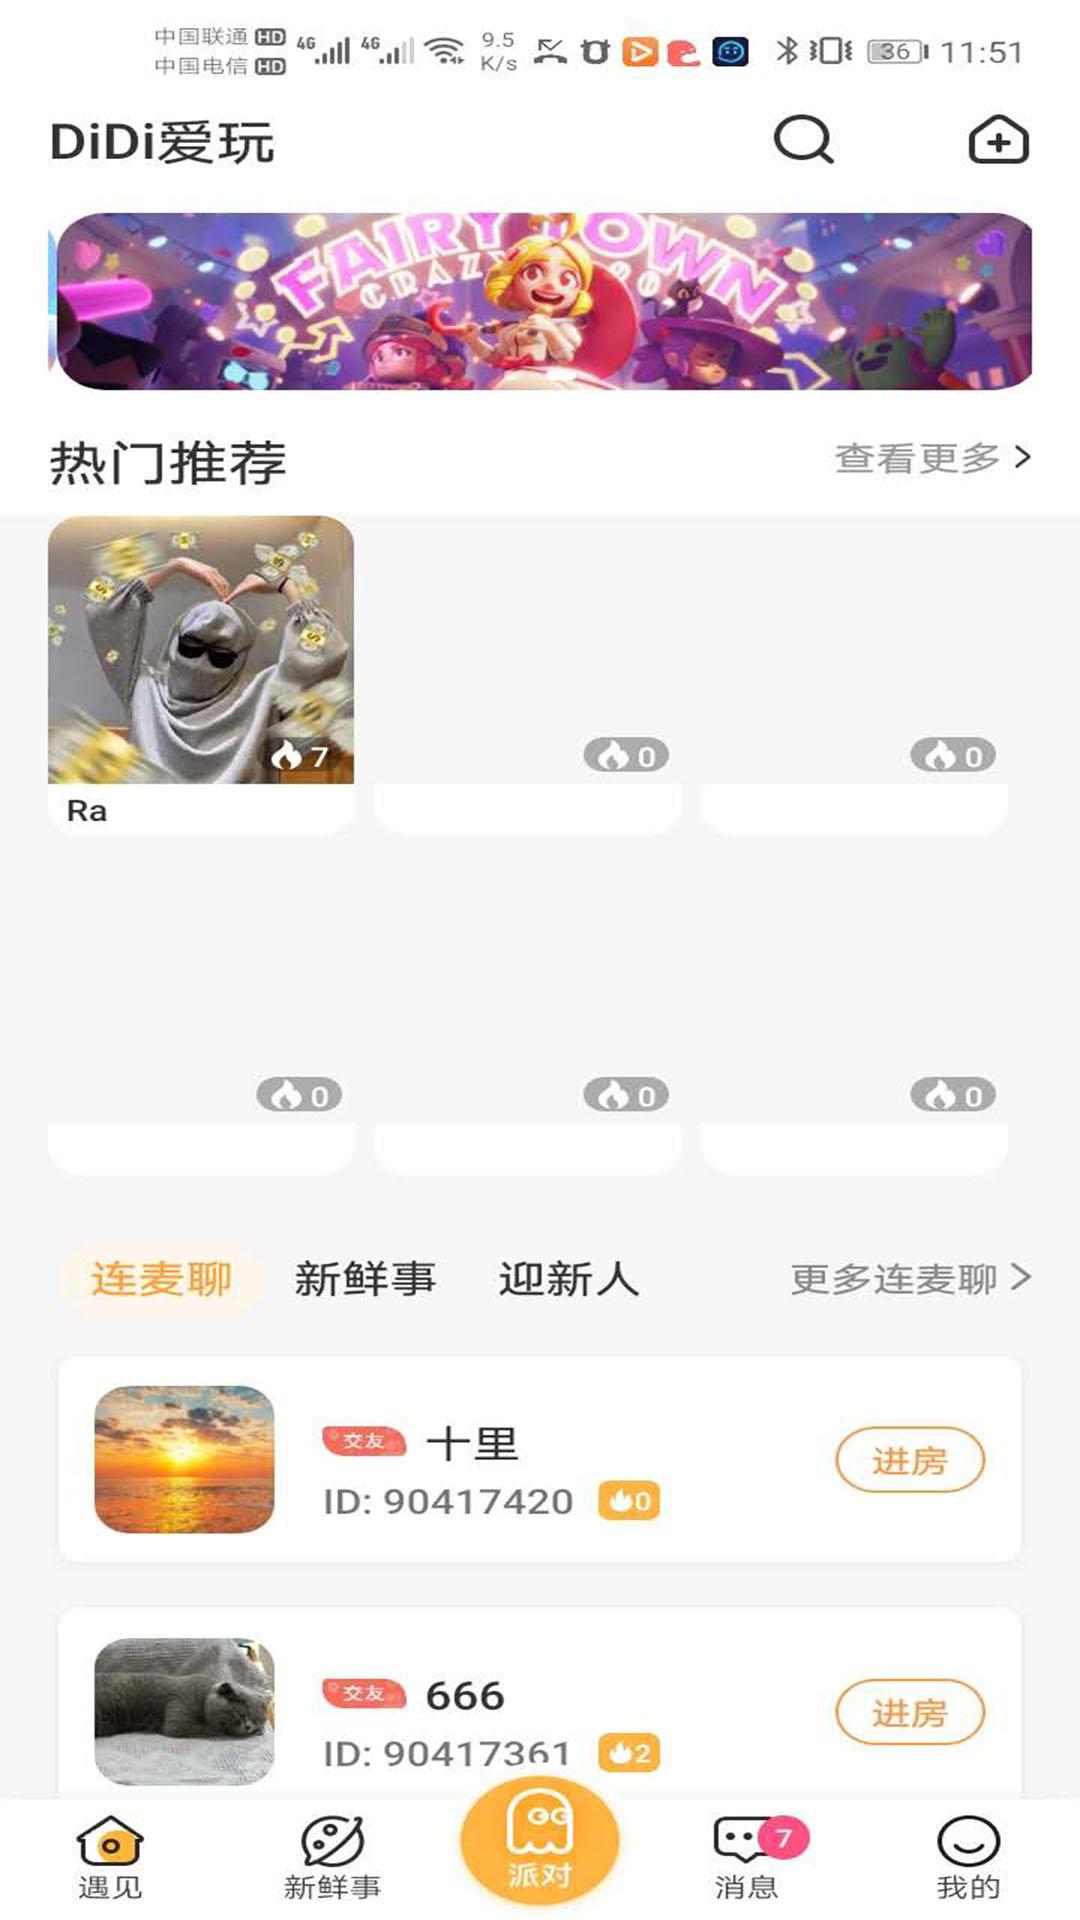 DiDi爱玩app下载官方版图2: